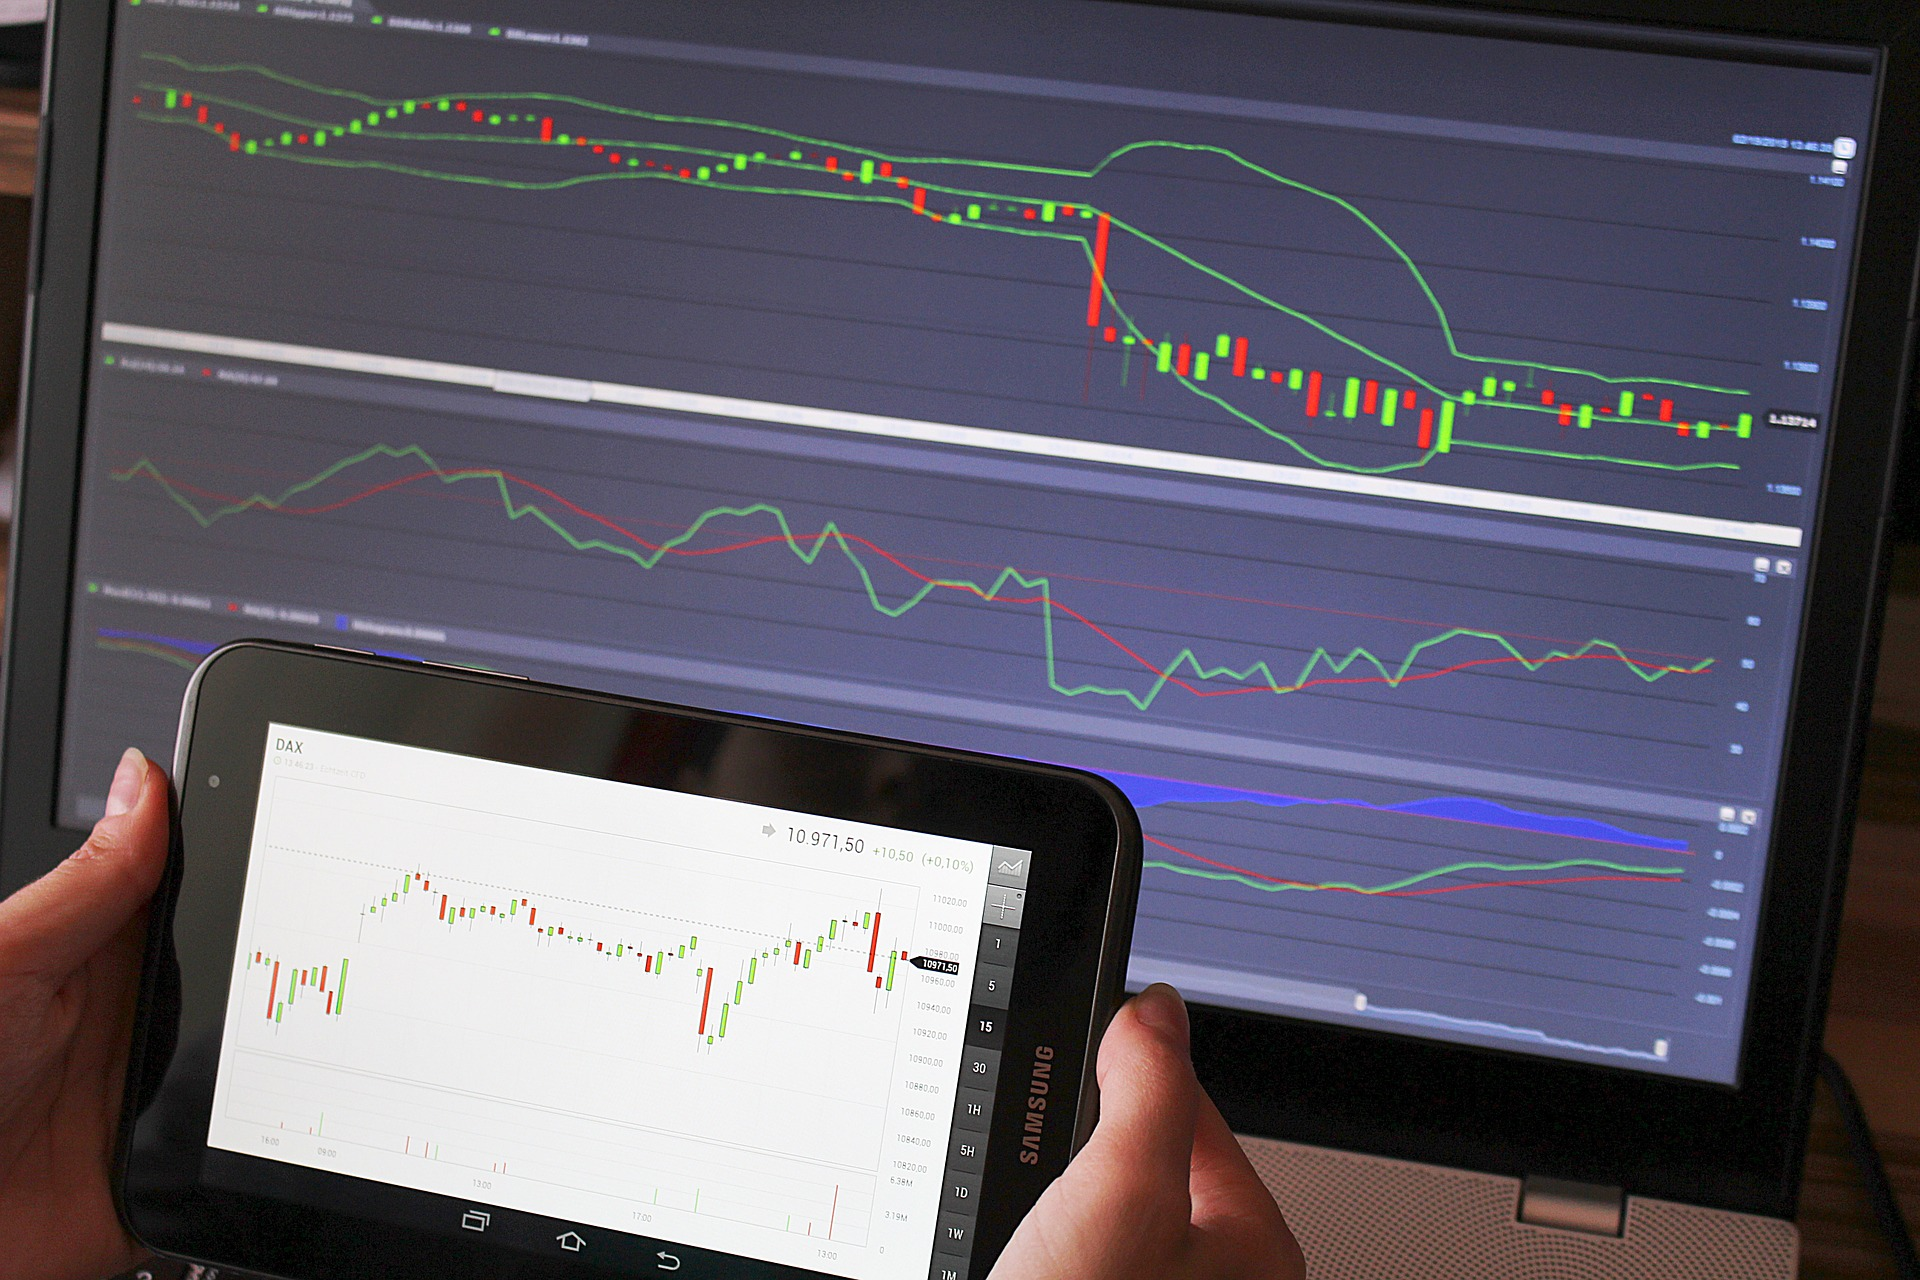 QuantBitex trading platform